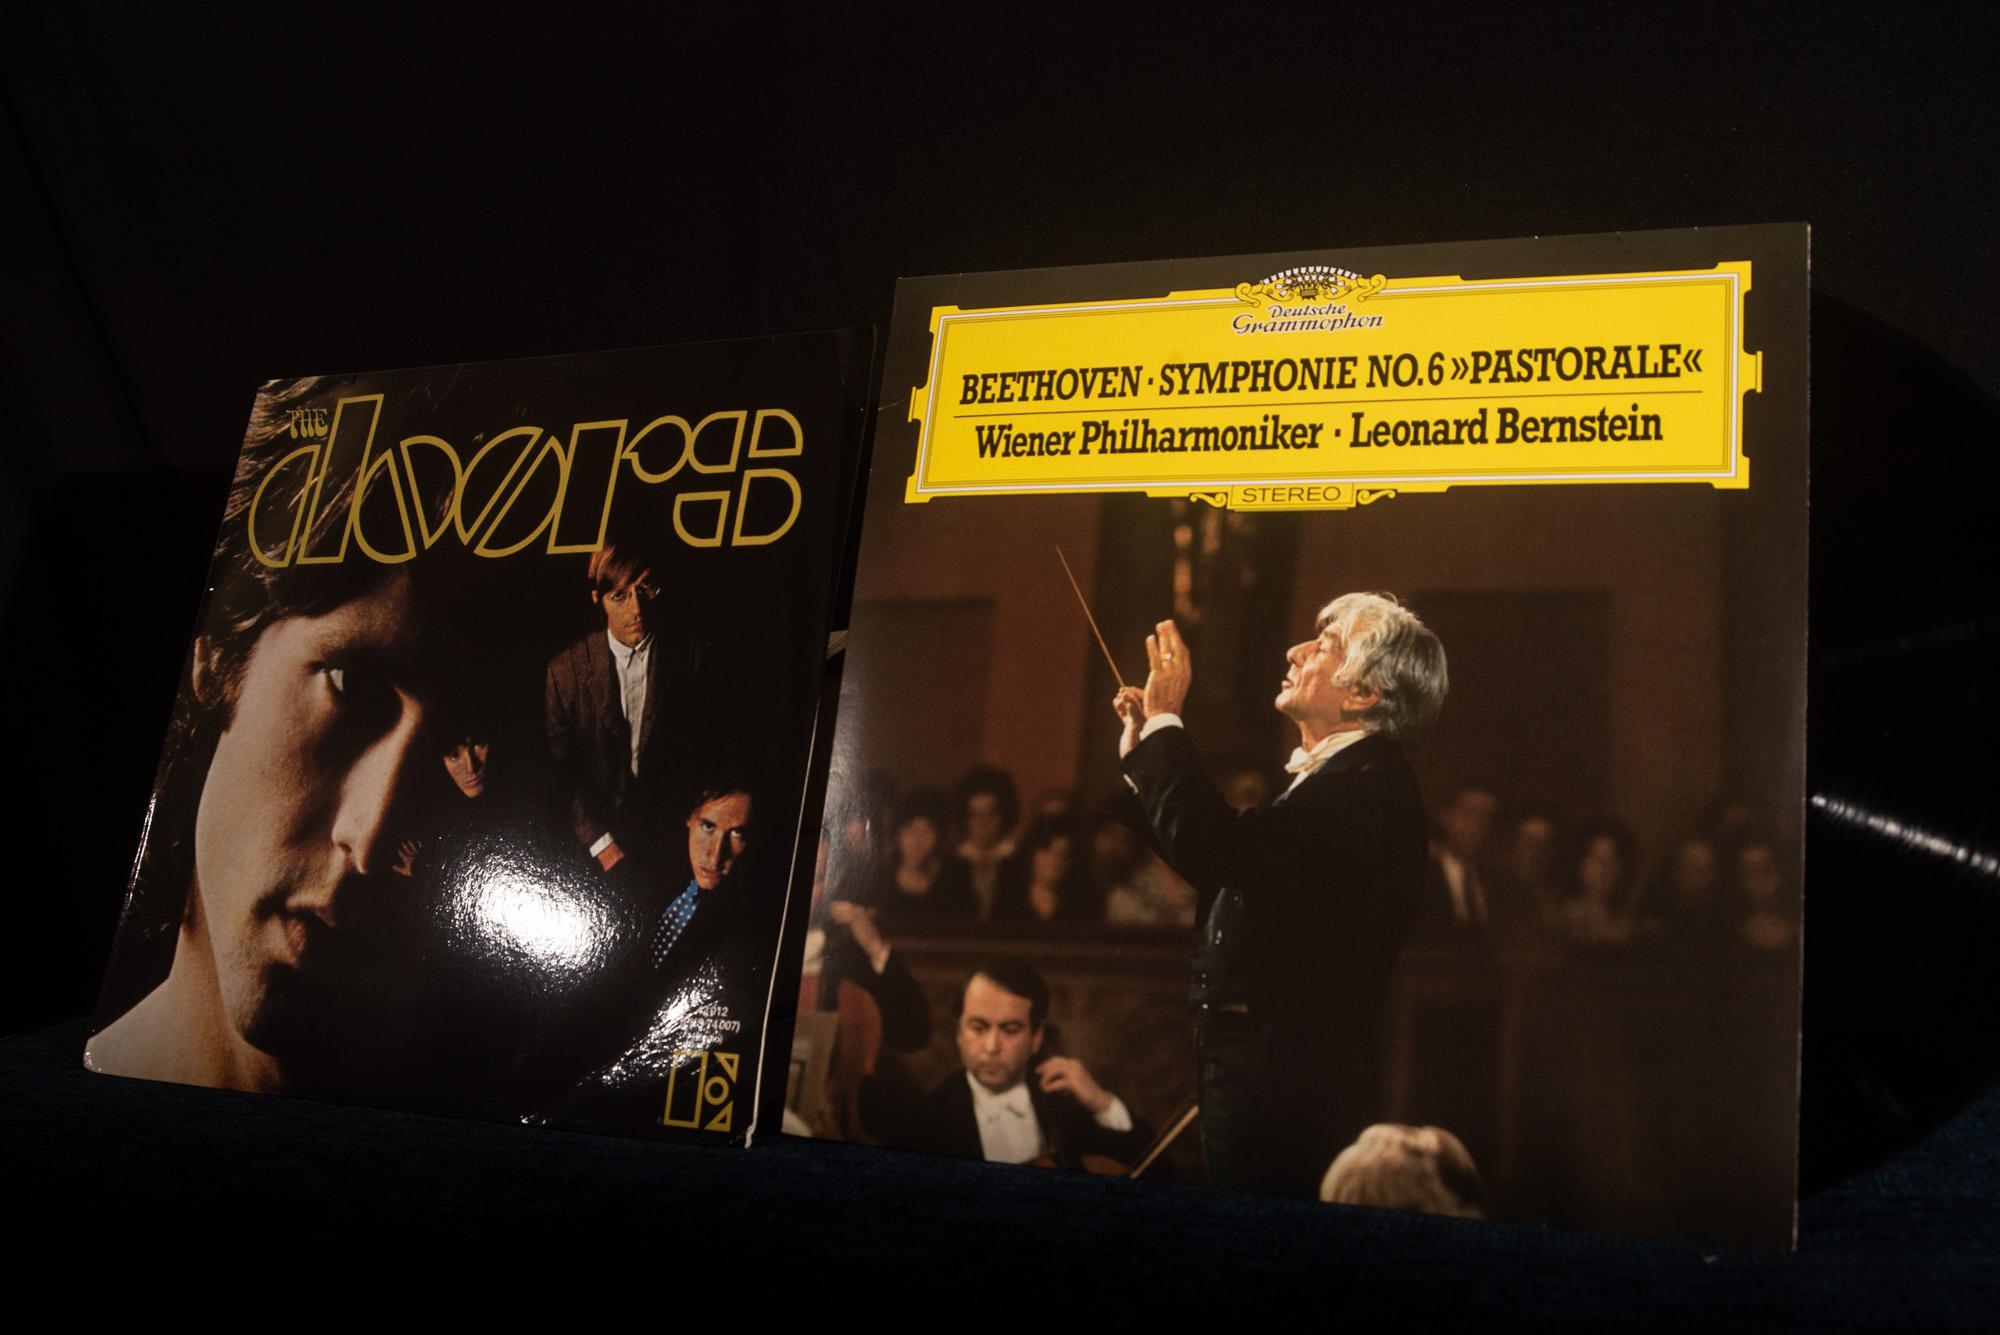 the doors and Beethoven Vinyl